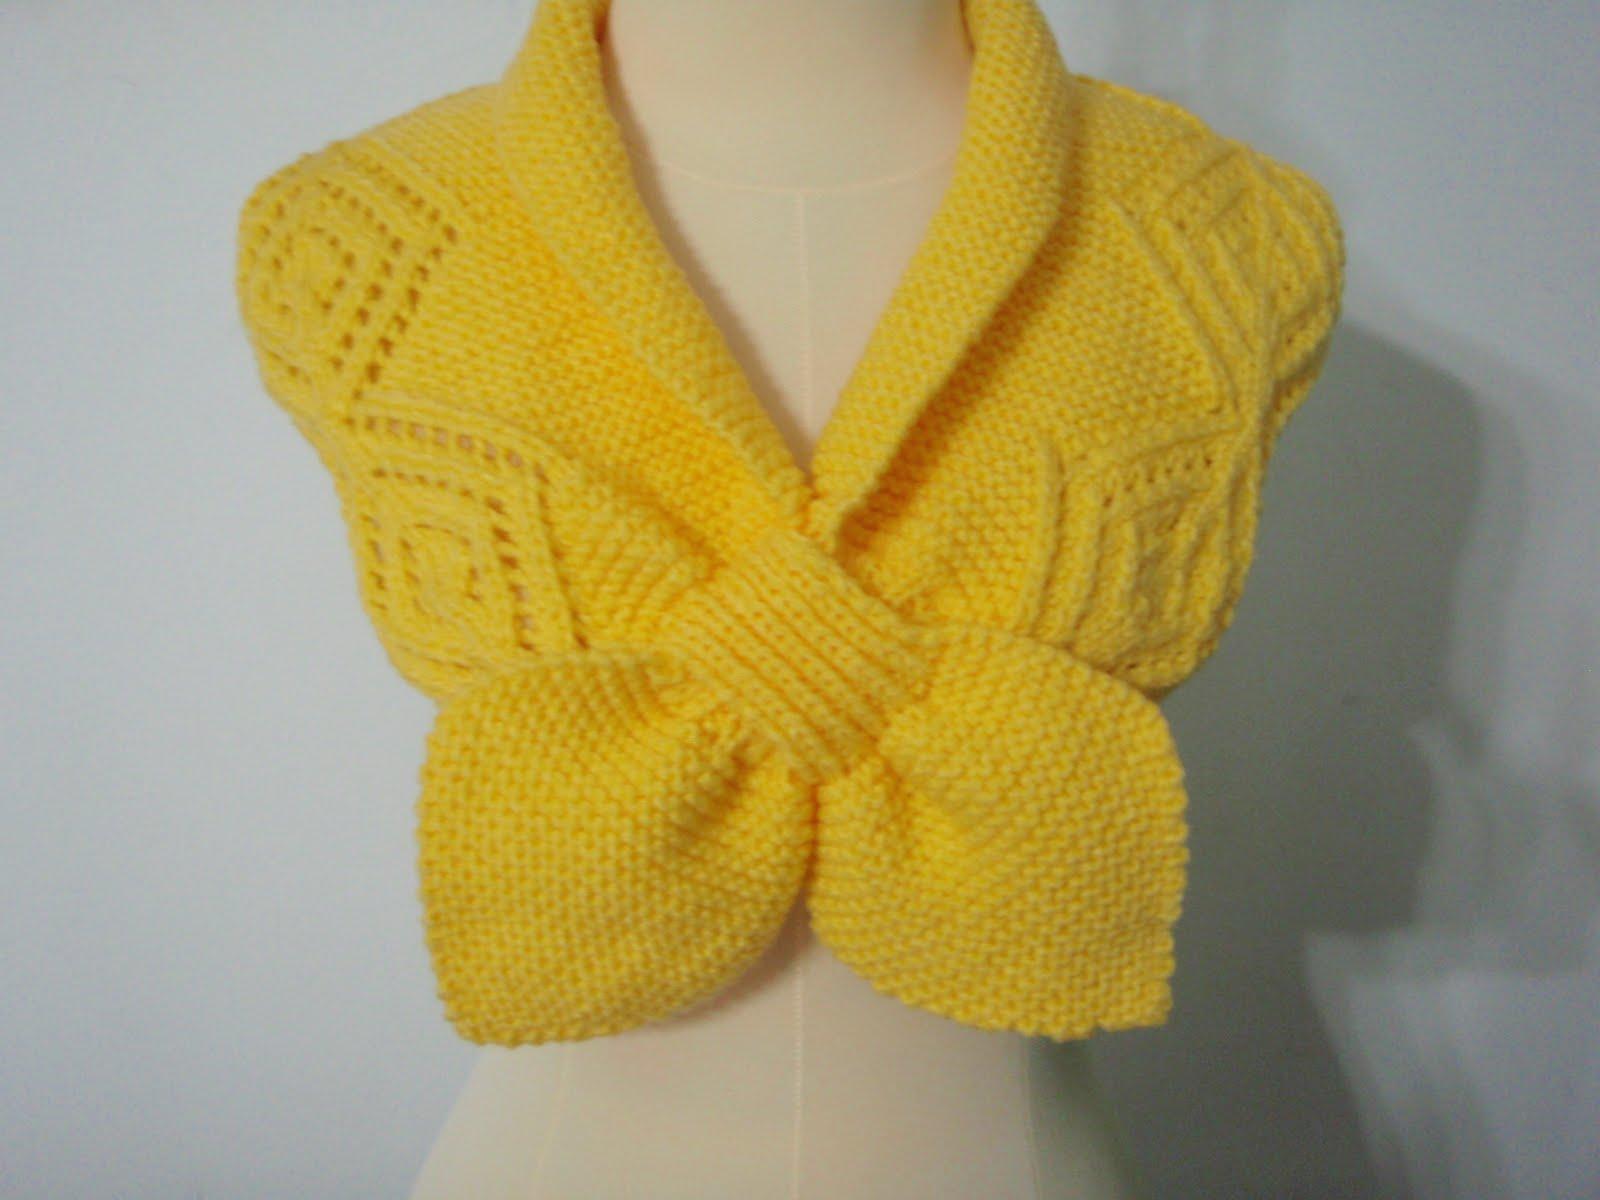 Knitting Patterns For Baby Neck Warmers : Myknittingdaily: Knitting Neck warmer Light Yellow